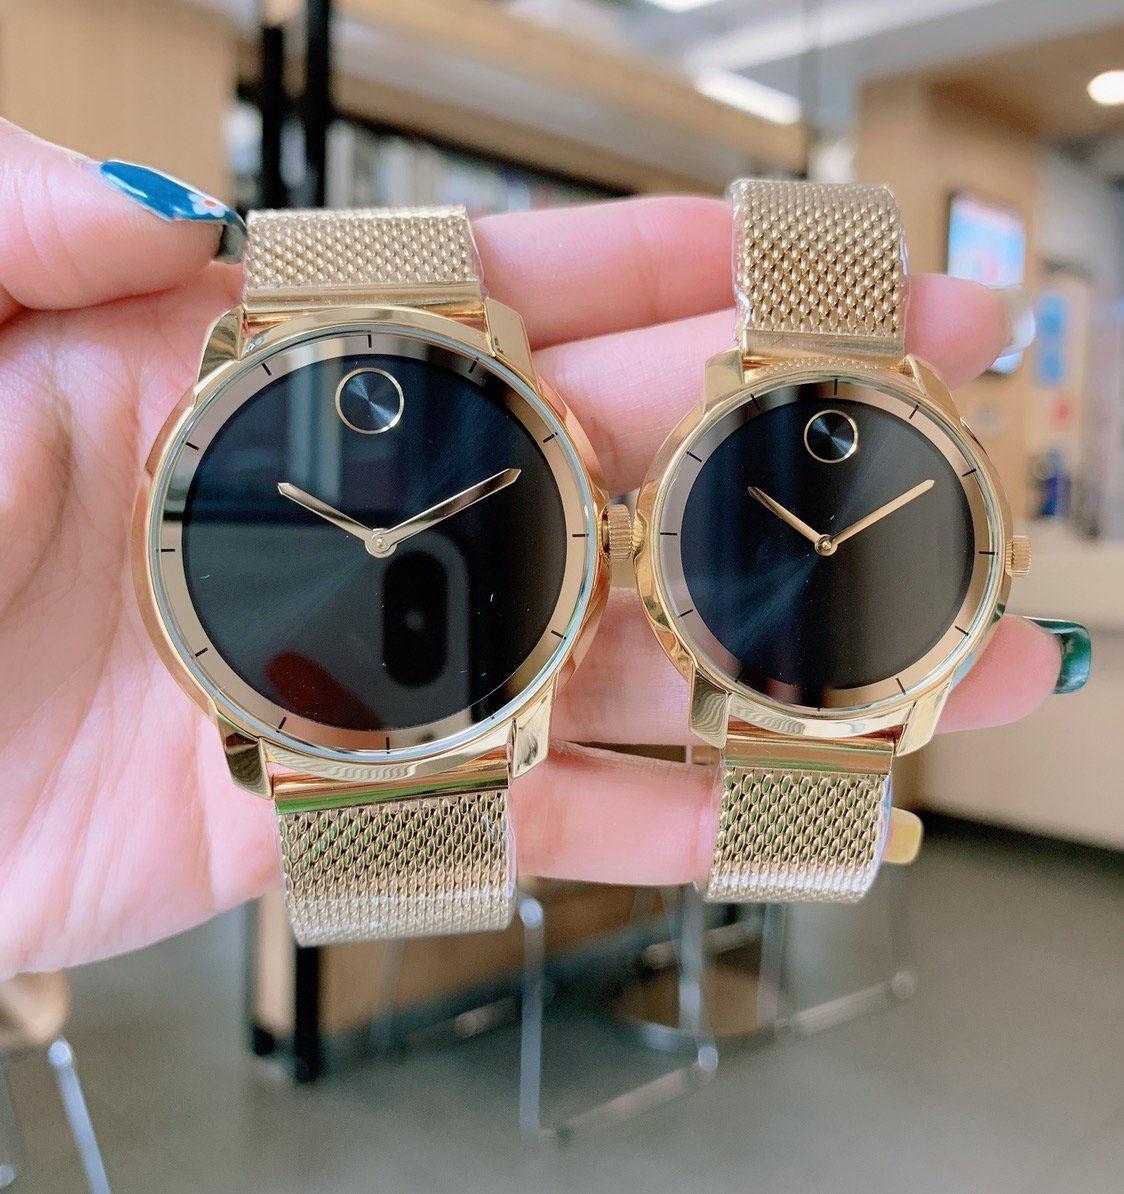 Armbanduhren Männer Frauen Uhren Paar Watch Quarz Bewegung Edelstahlband Hohe Qualität Wasserdichte Party Big: 43mm klein: 36mm